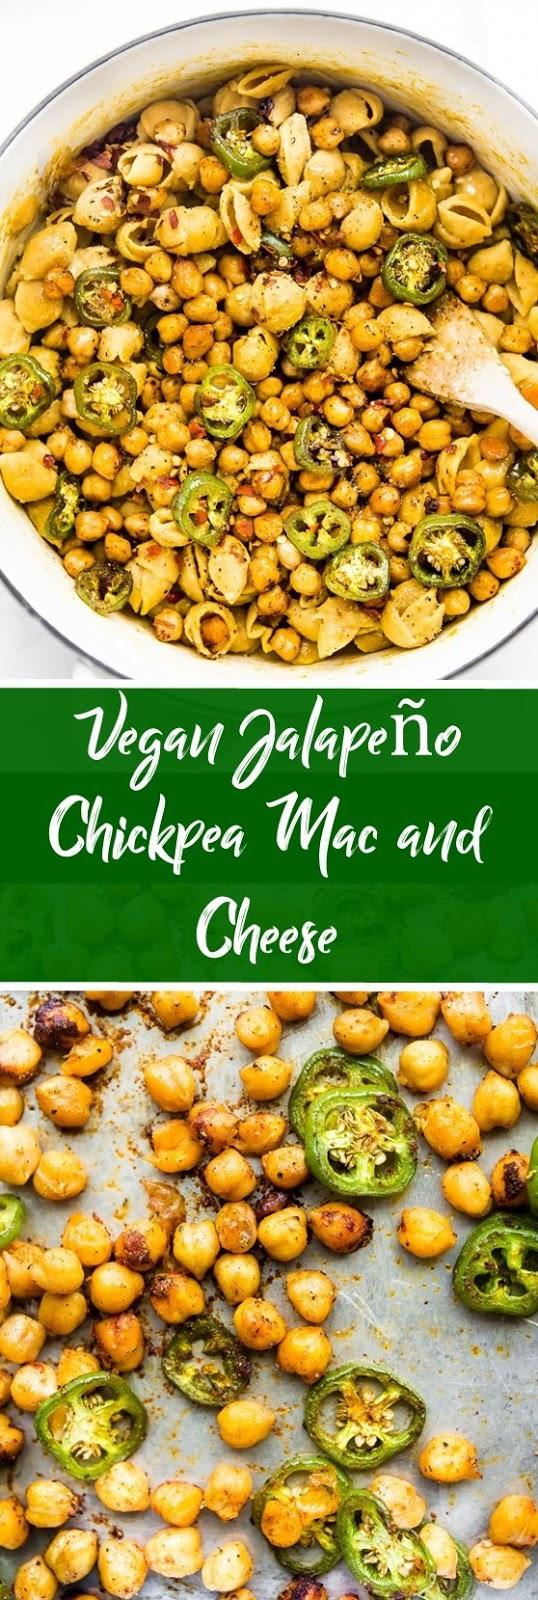 Vegan Jalapeño Chickpea Mac and Cheese #vegan #veganrecipe #healthyrecipe